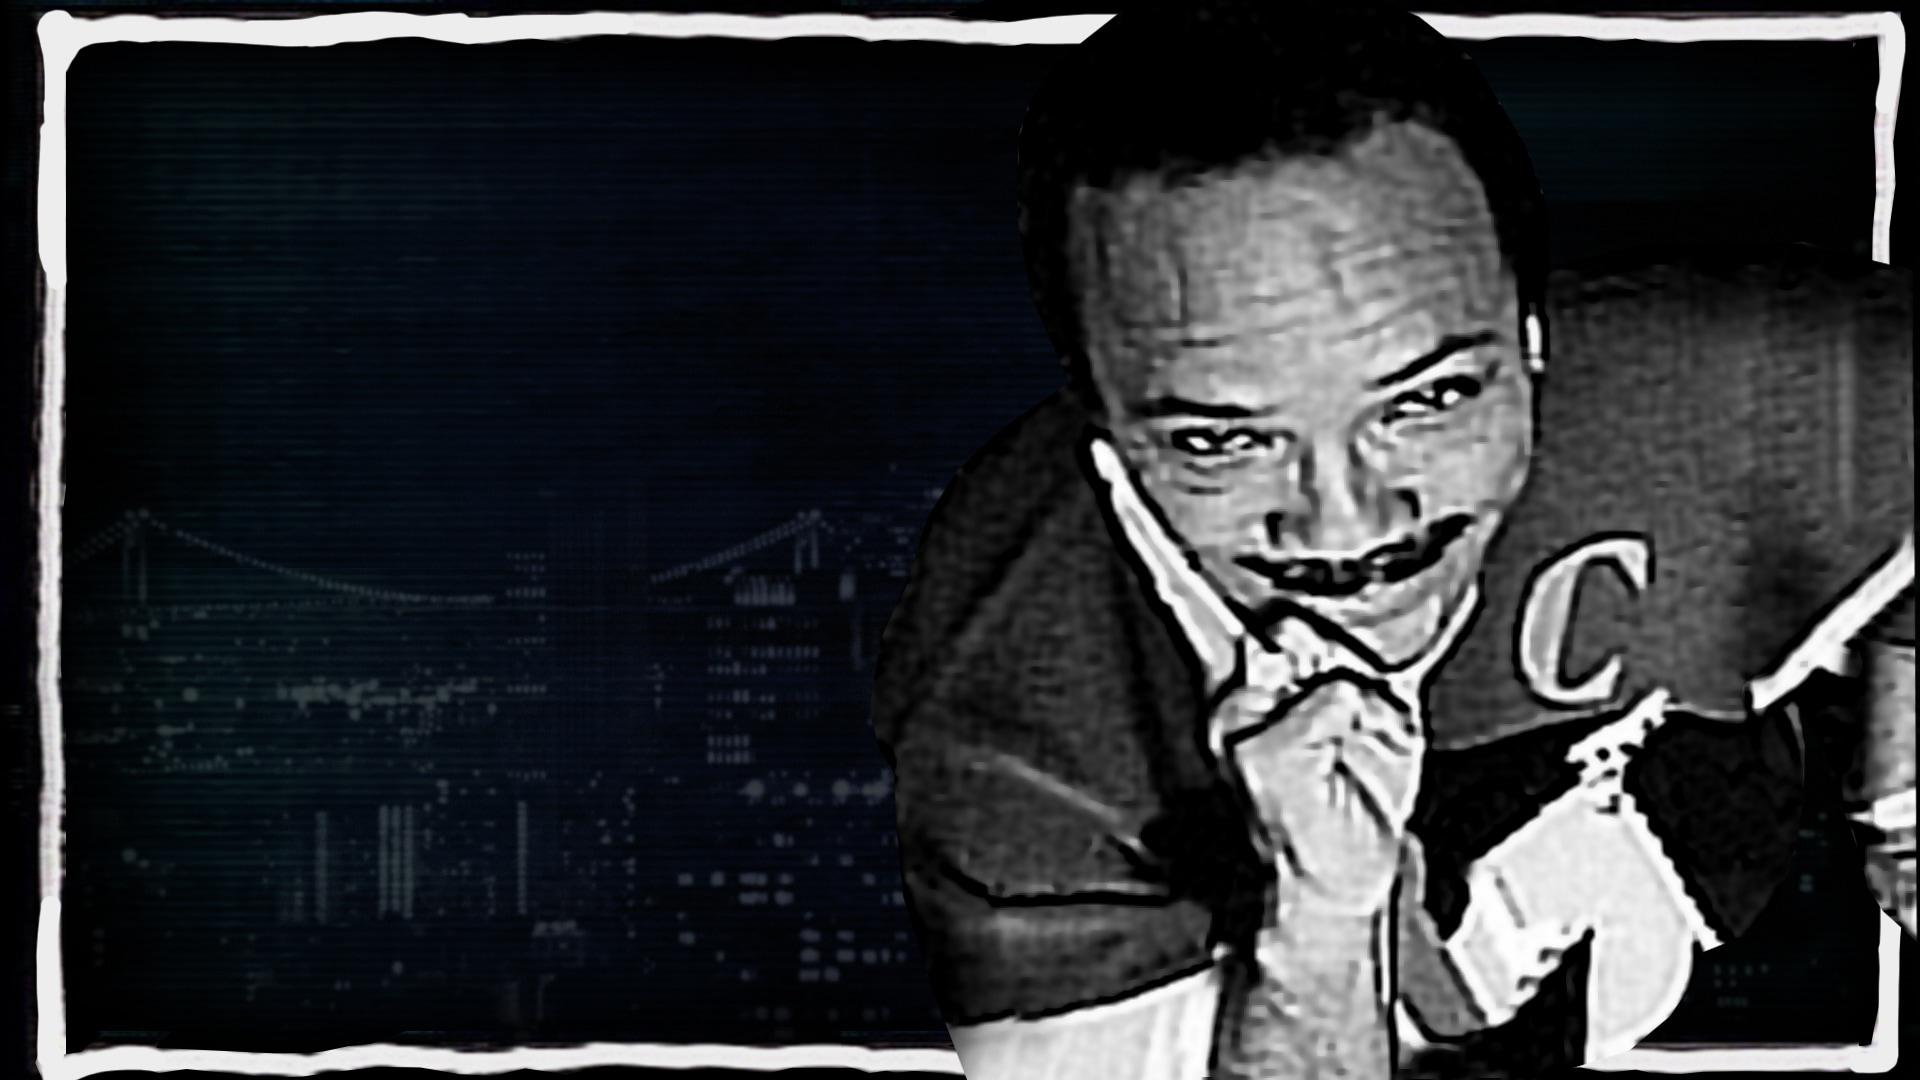 Quincy Jones: February 10, 1990